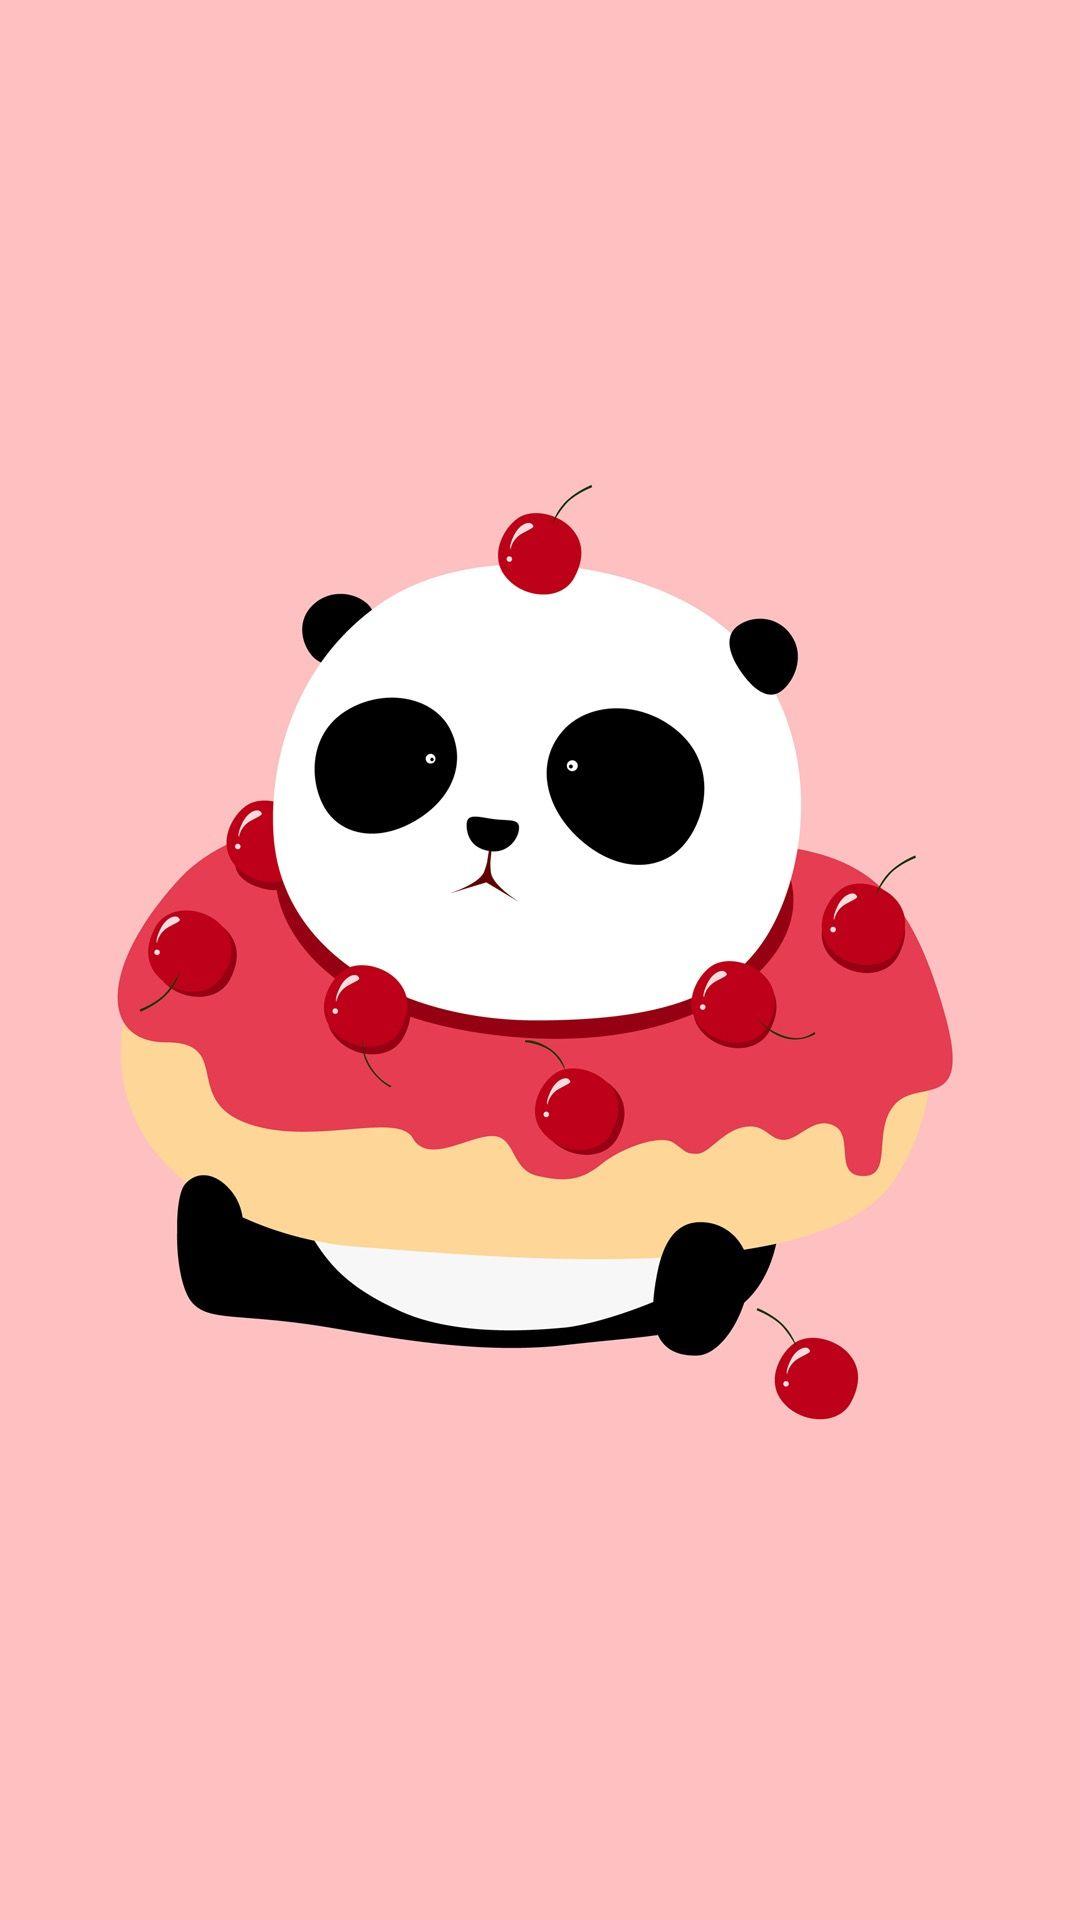 Kersttrui Met Dab.Who Love Panda Panda Panda Fondos De Pantalla Tiernos Fondos